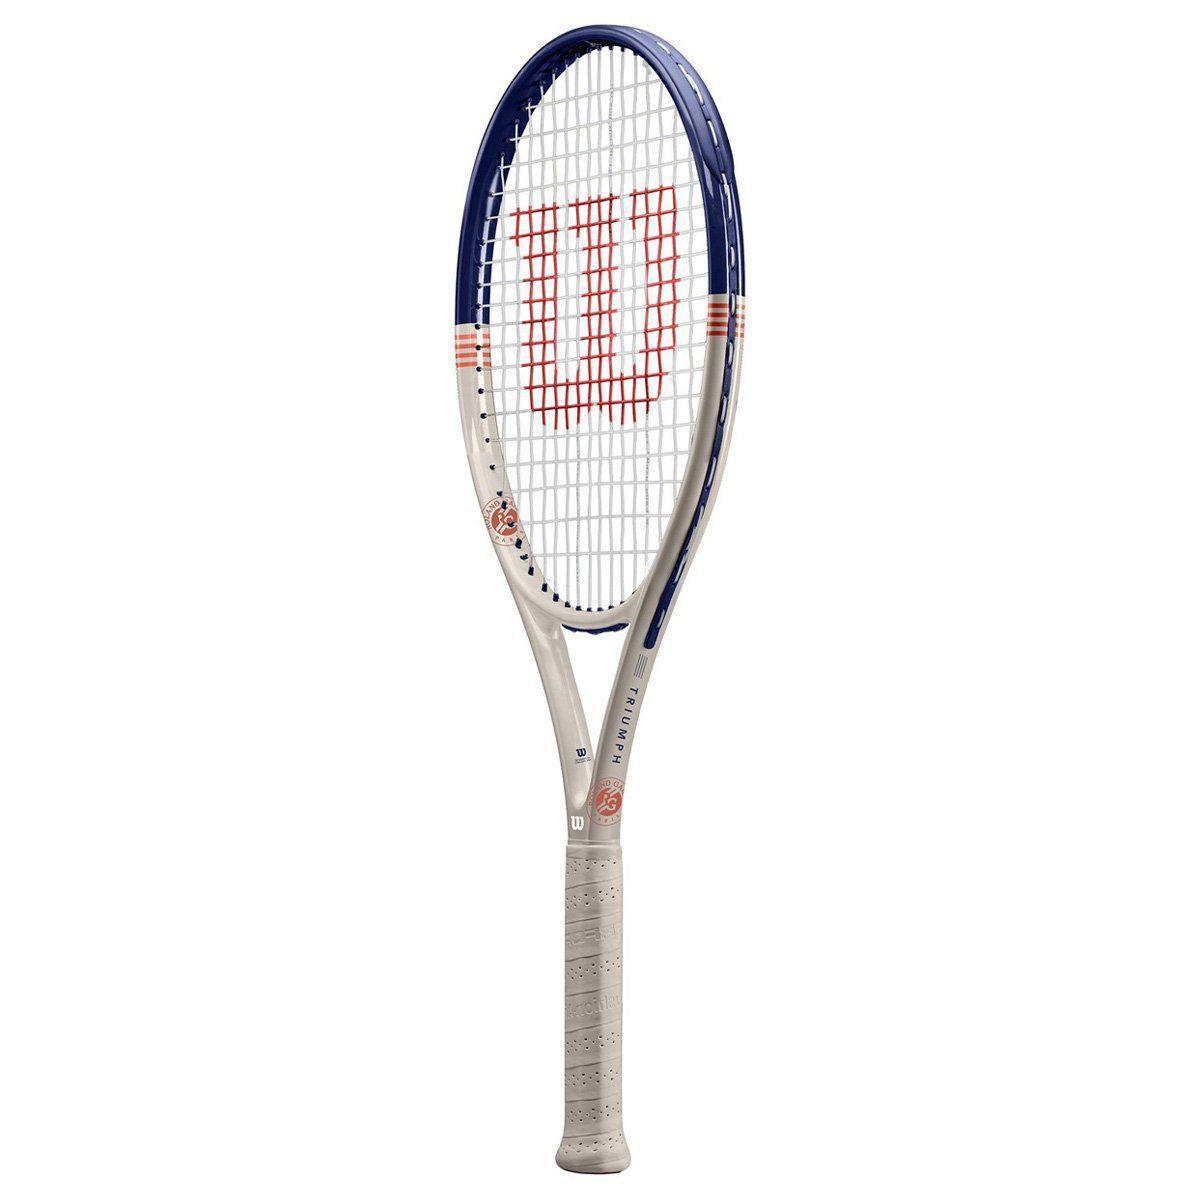 Raquete de Tênis Wilson Triumph 2 Roland Garros 2020 + Tubo de Bola Inni  - REAL ESPORTE